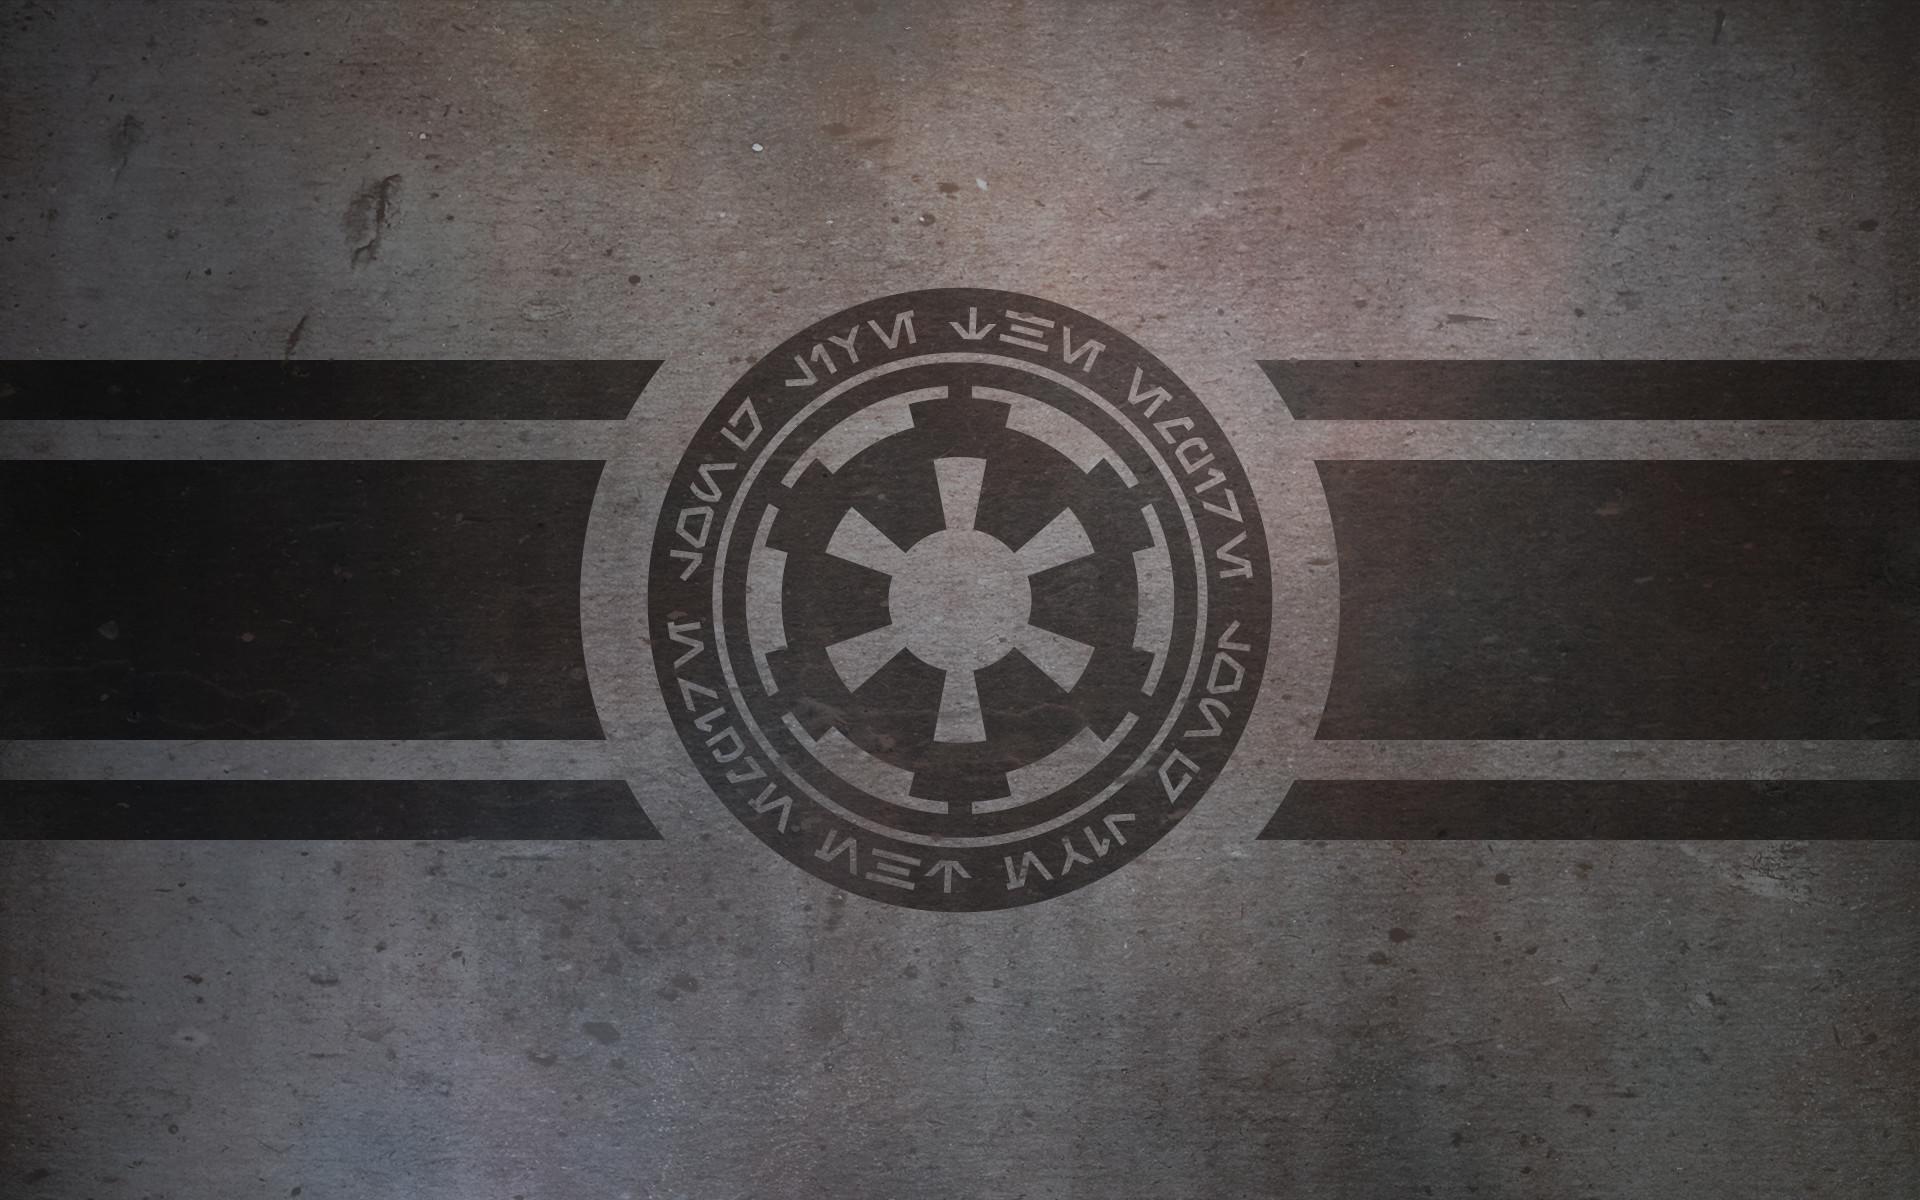 star wars empire wallpaper (68+ images)